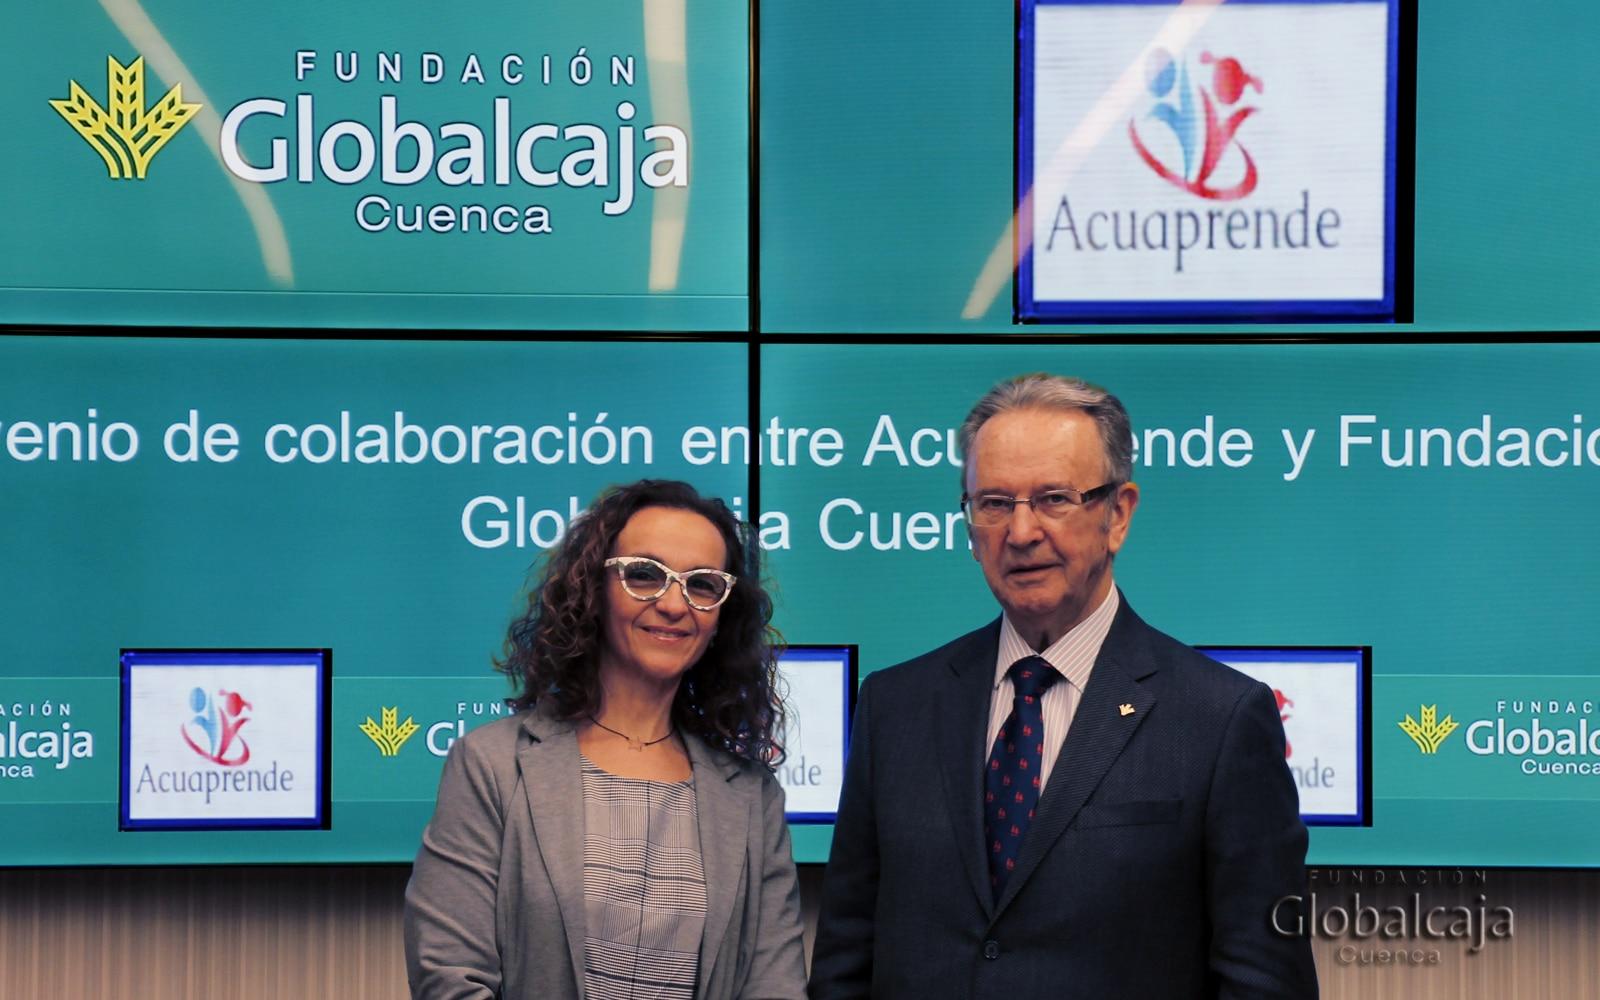 https://blog.globalcaja.es/wp-content/uploads/2017/11/Globalcaja-convenio-acuaprende.jpg